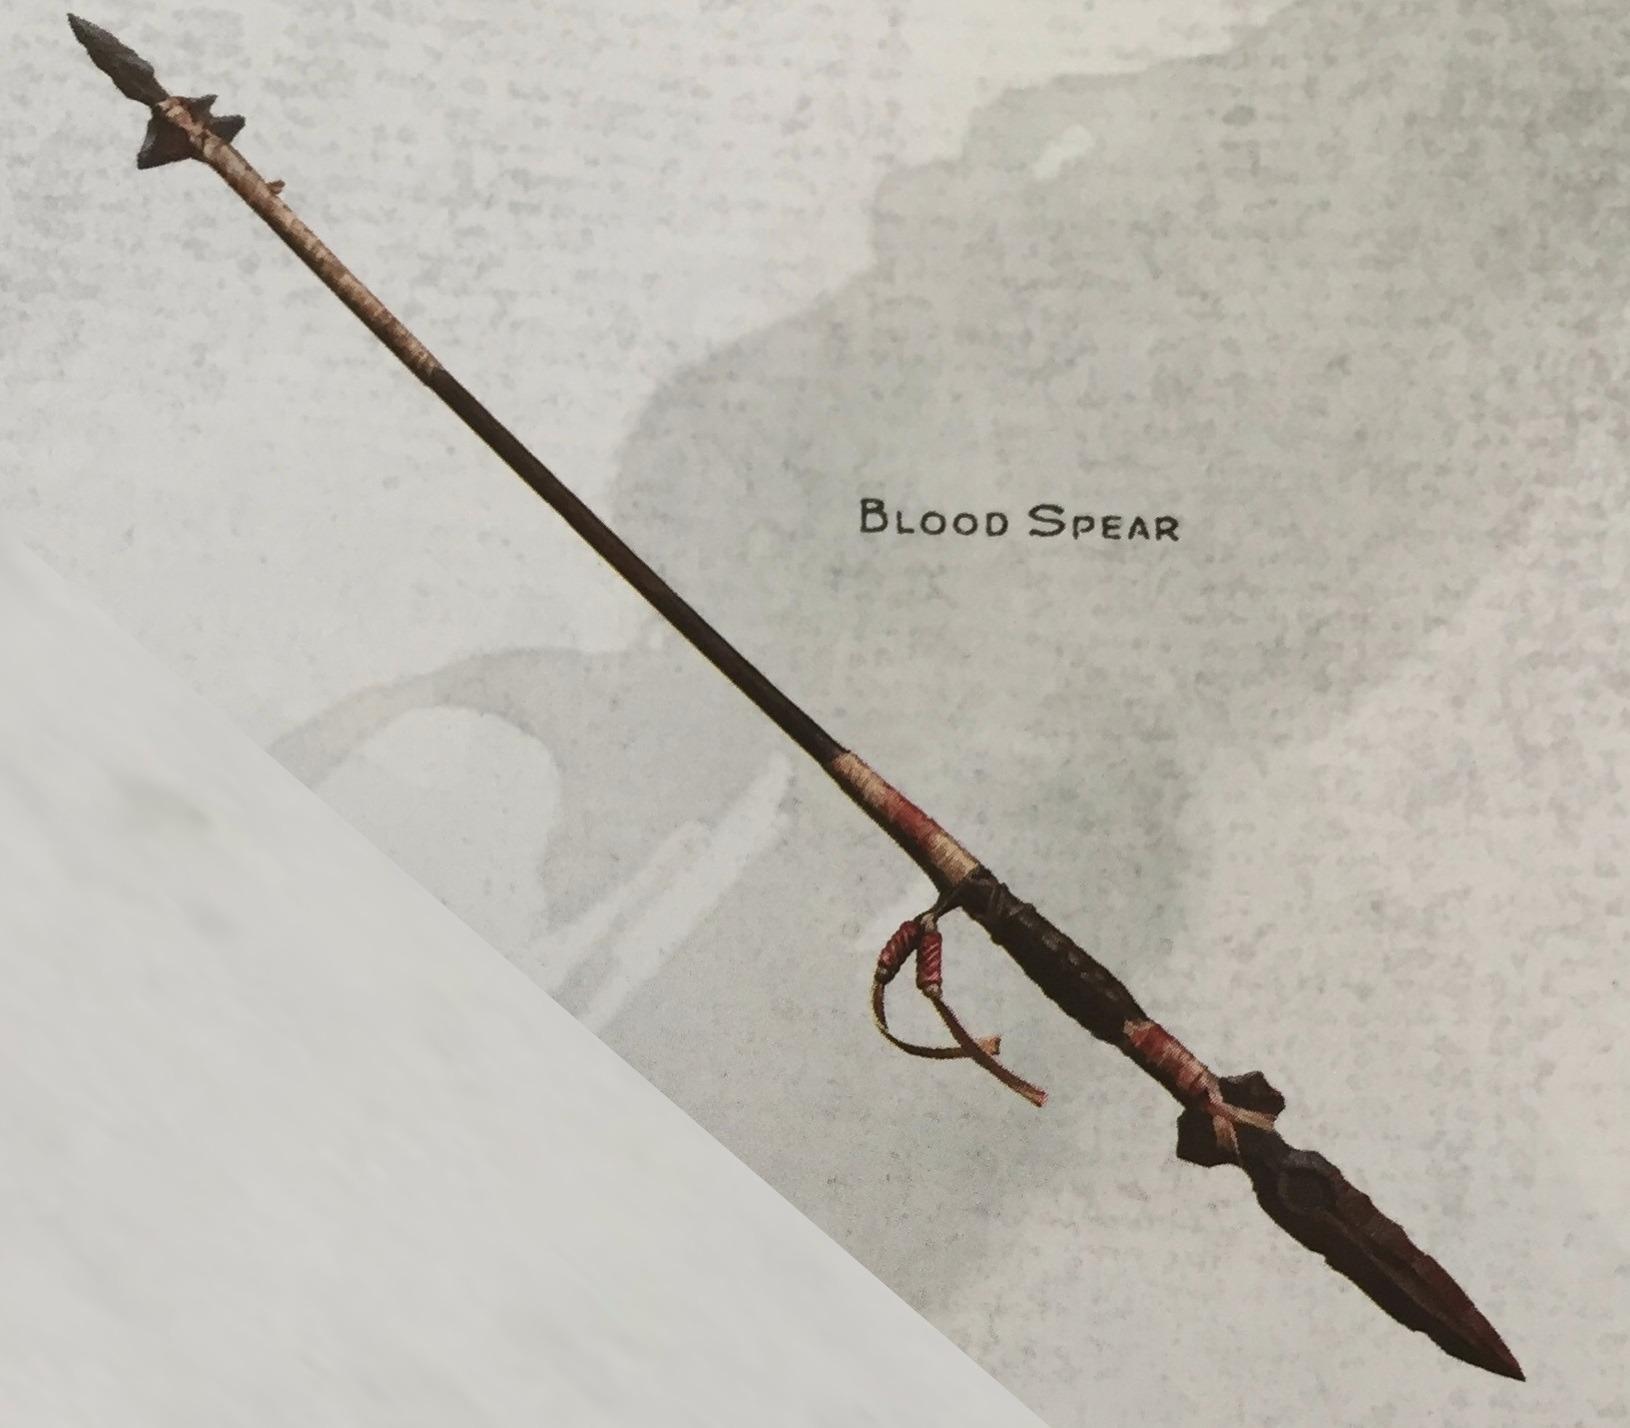 bloodspear.jpg